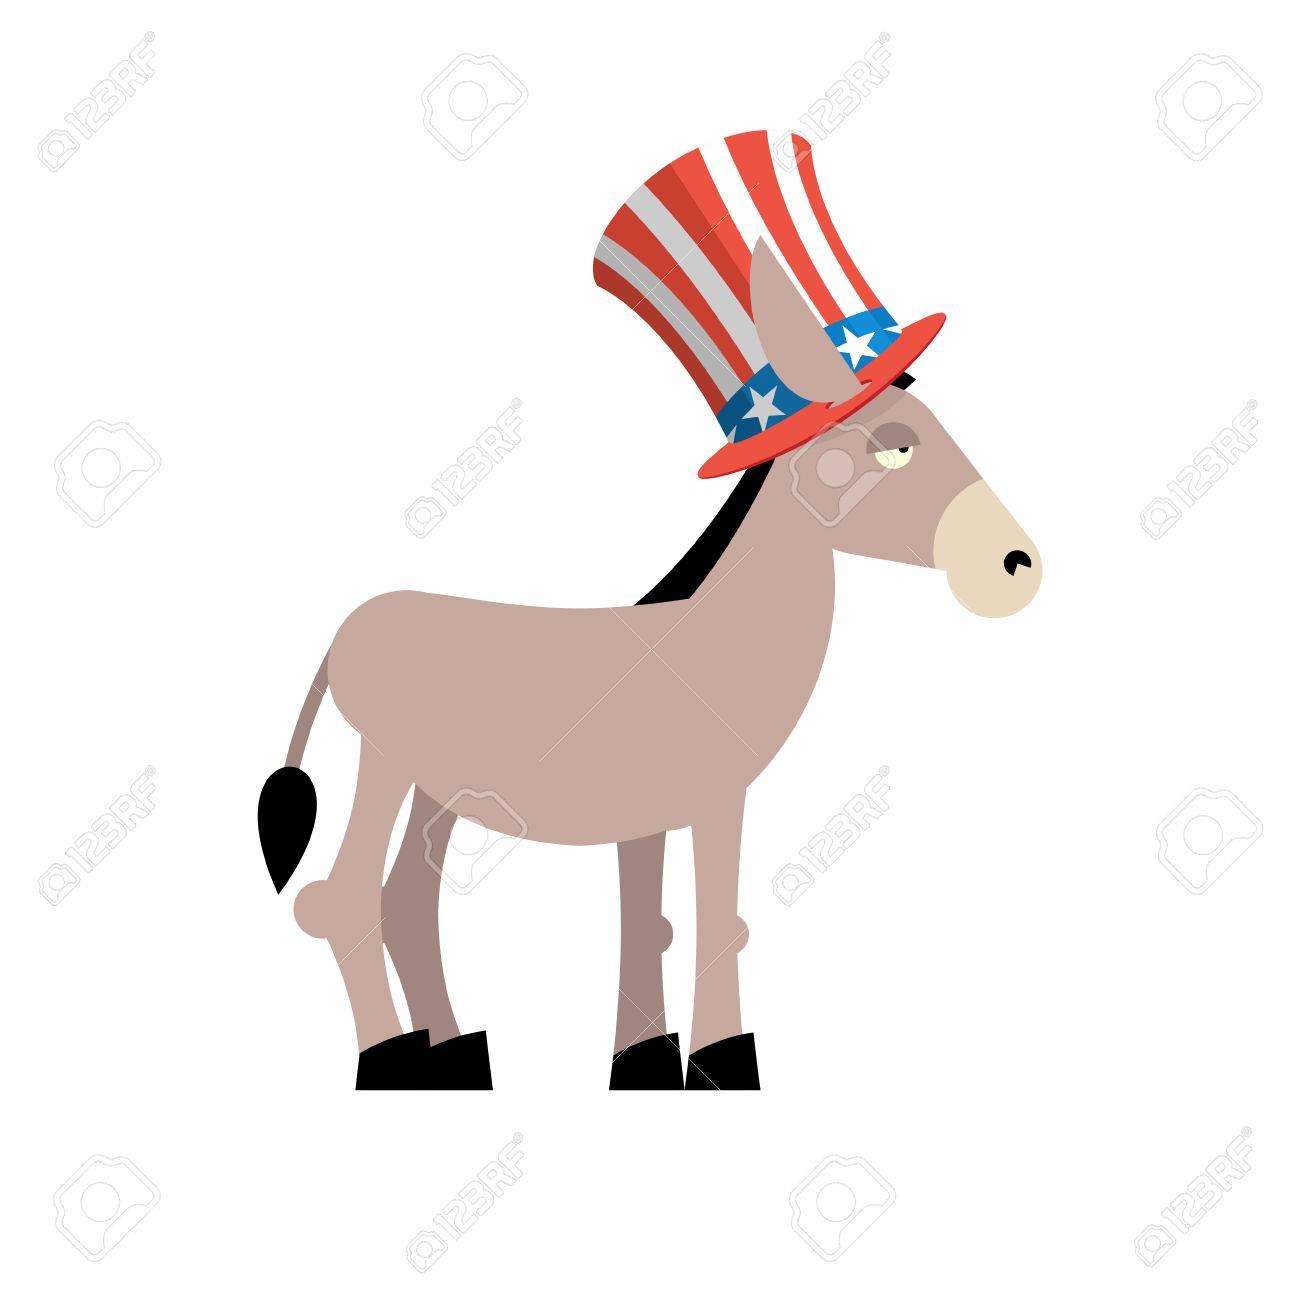 Donkey democrat donkey in uncle sam hat symbol of political donkey democrat donkey in uncle sam hat symbol of political party in america biocorpaavc Image collections